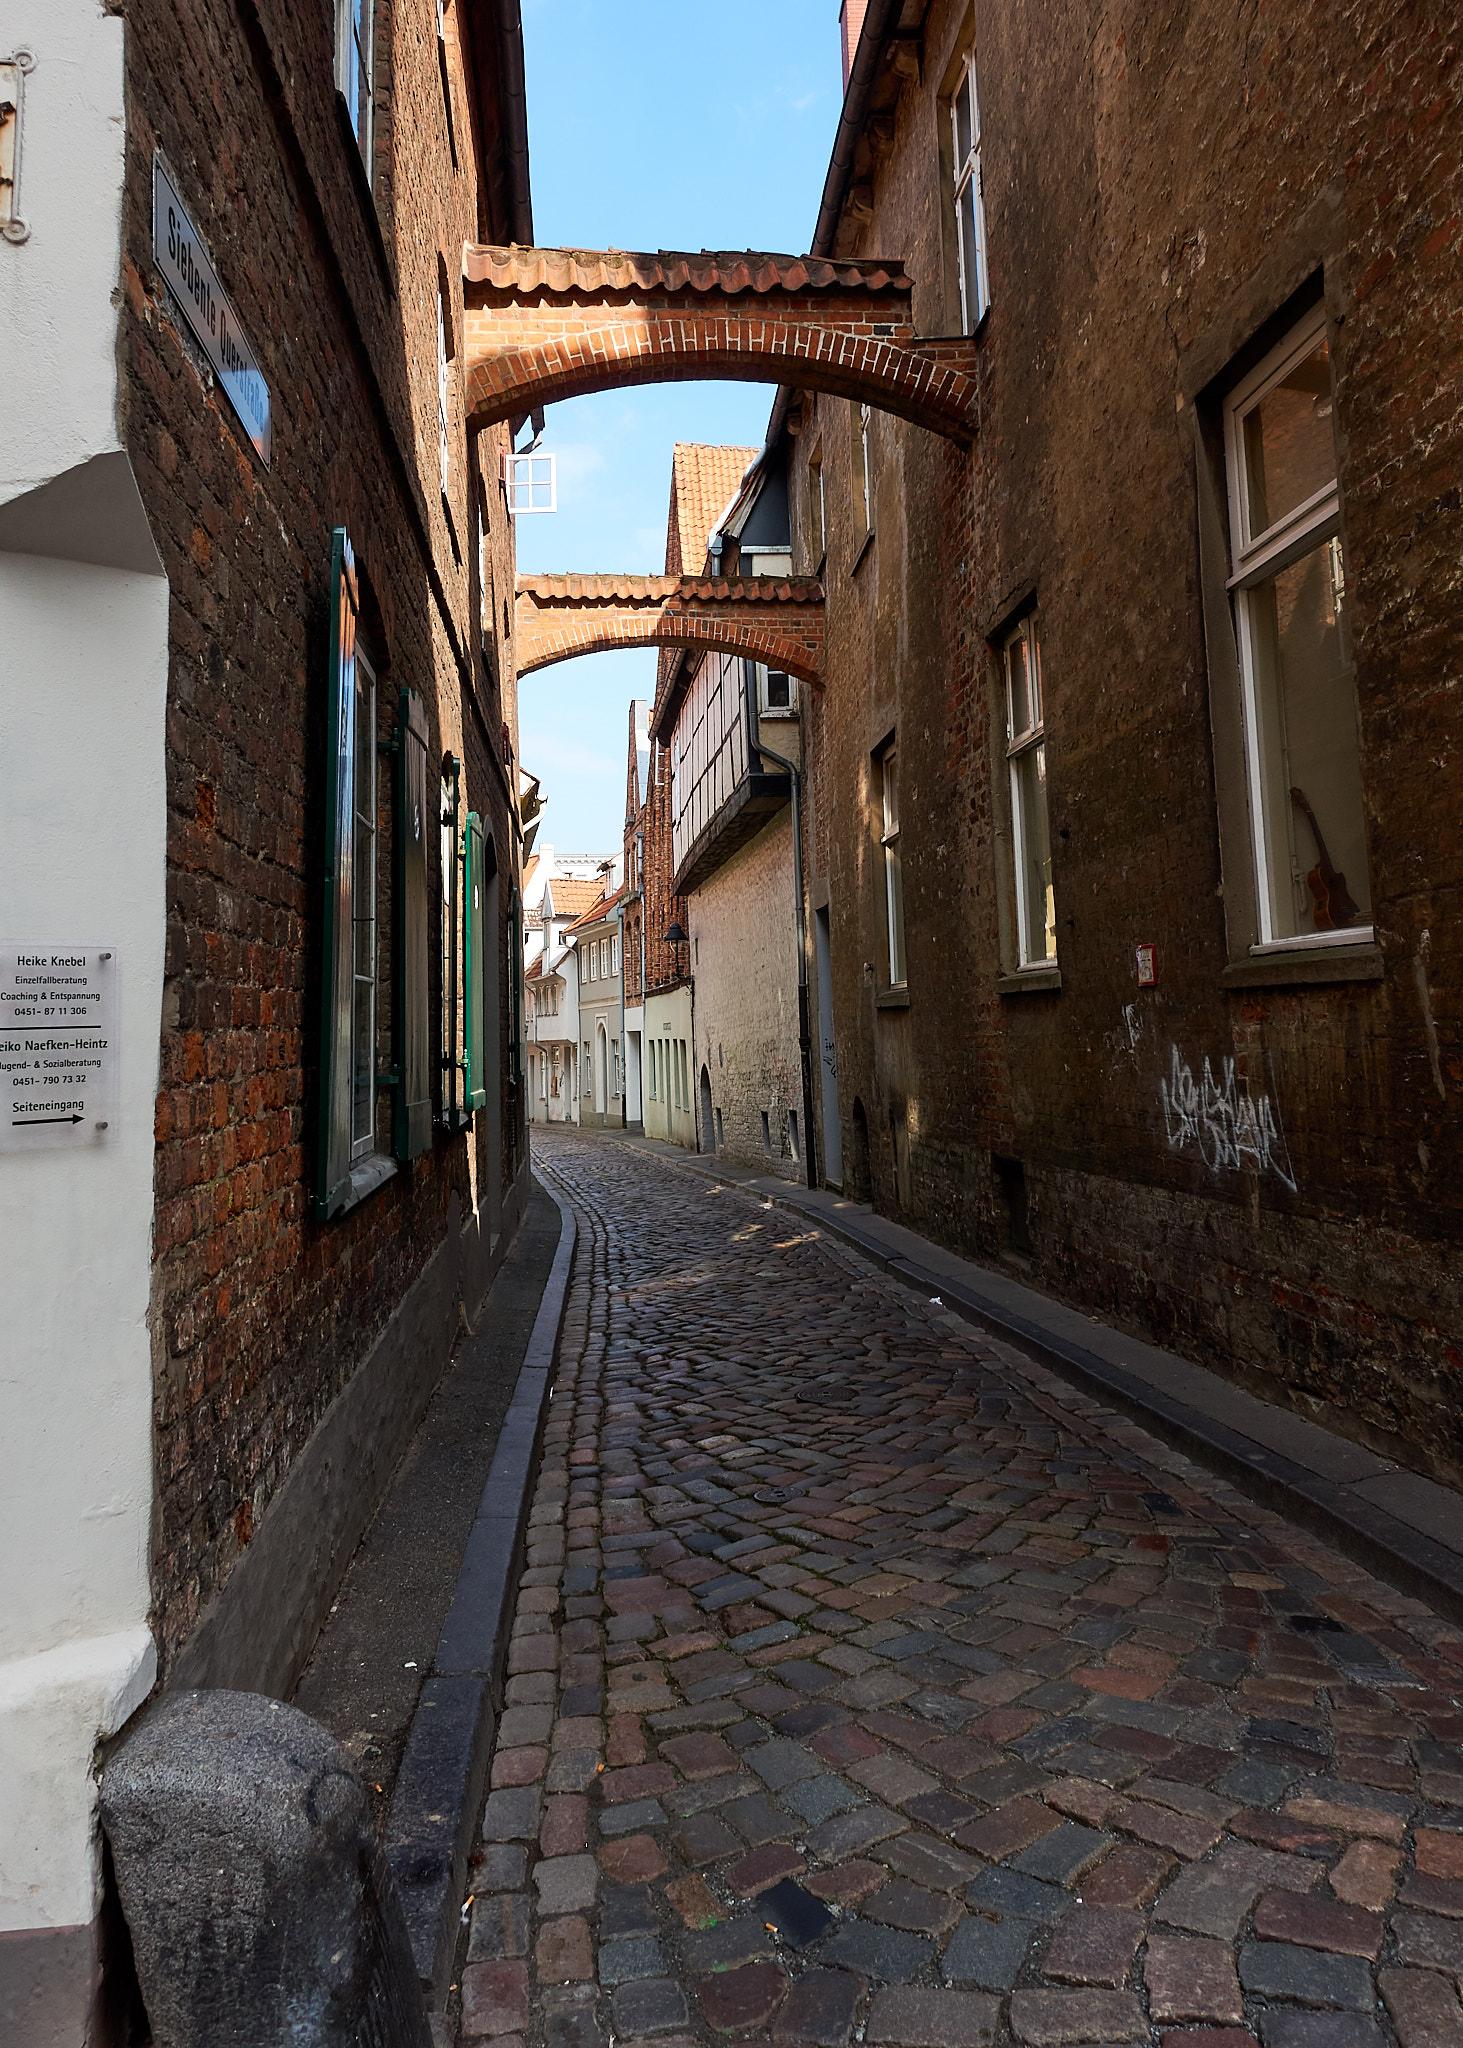 20190330-Lübeck-336.jpg